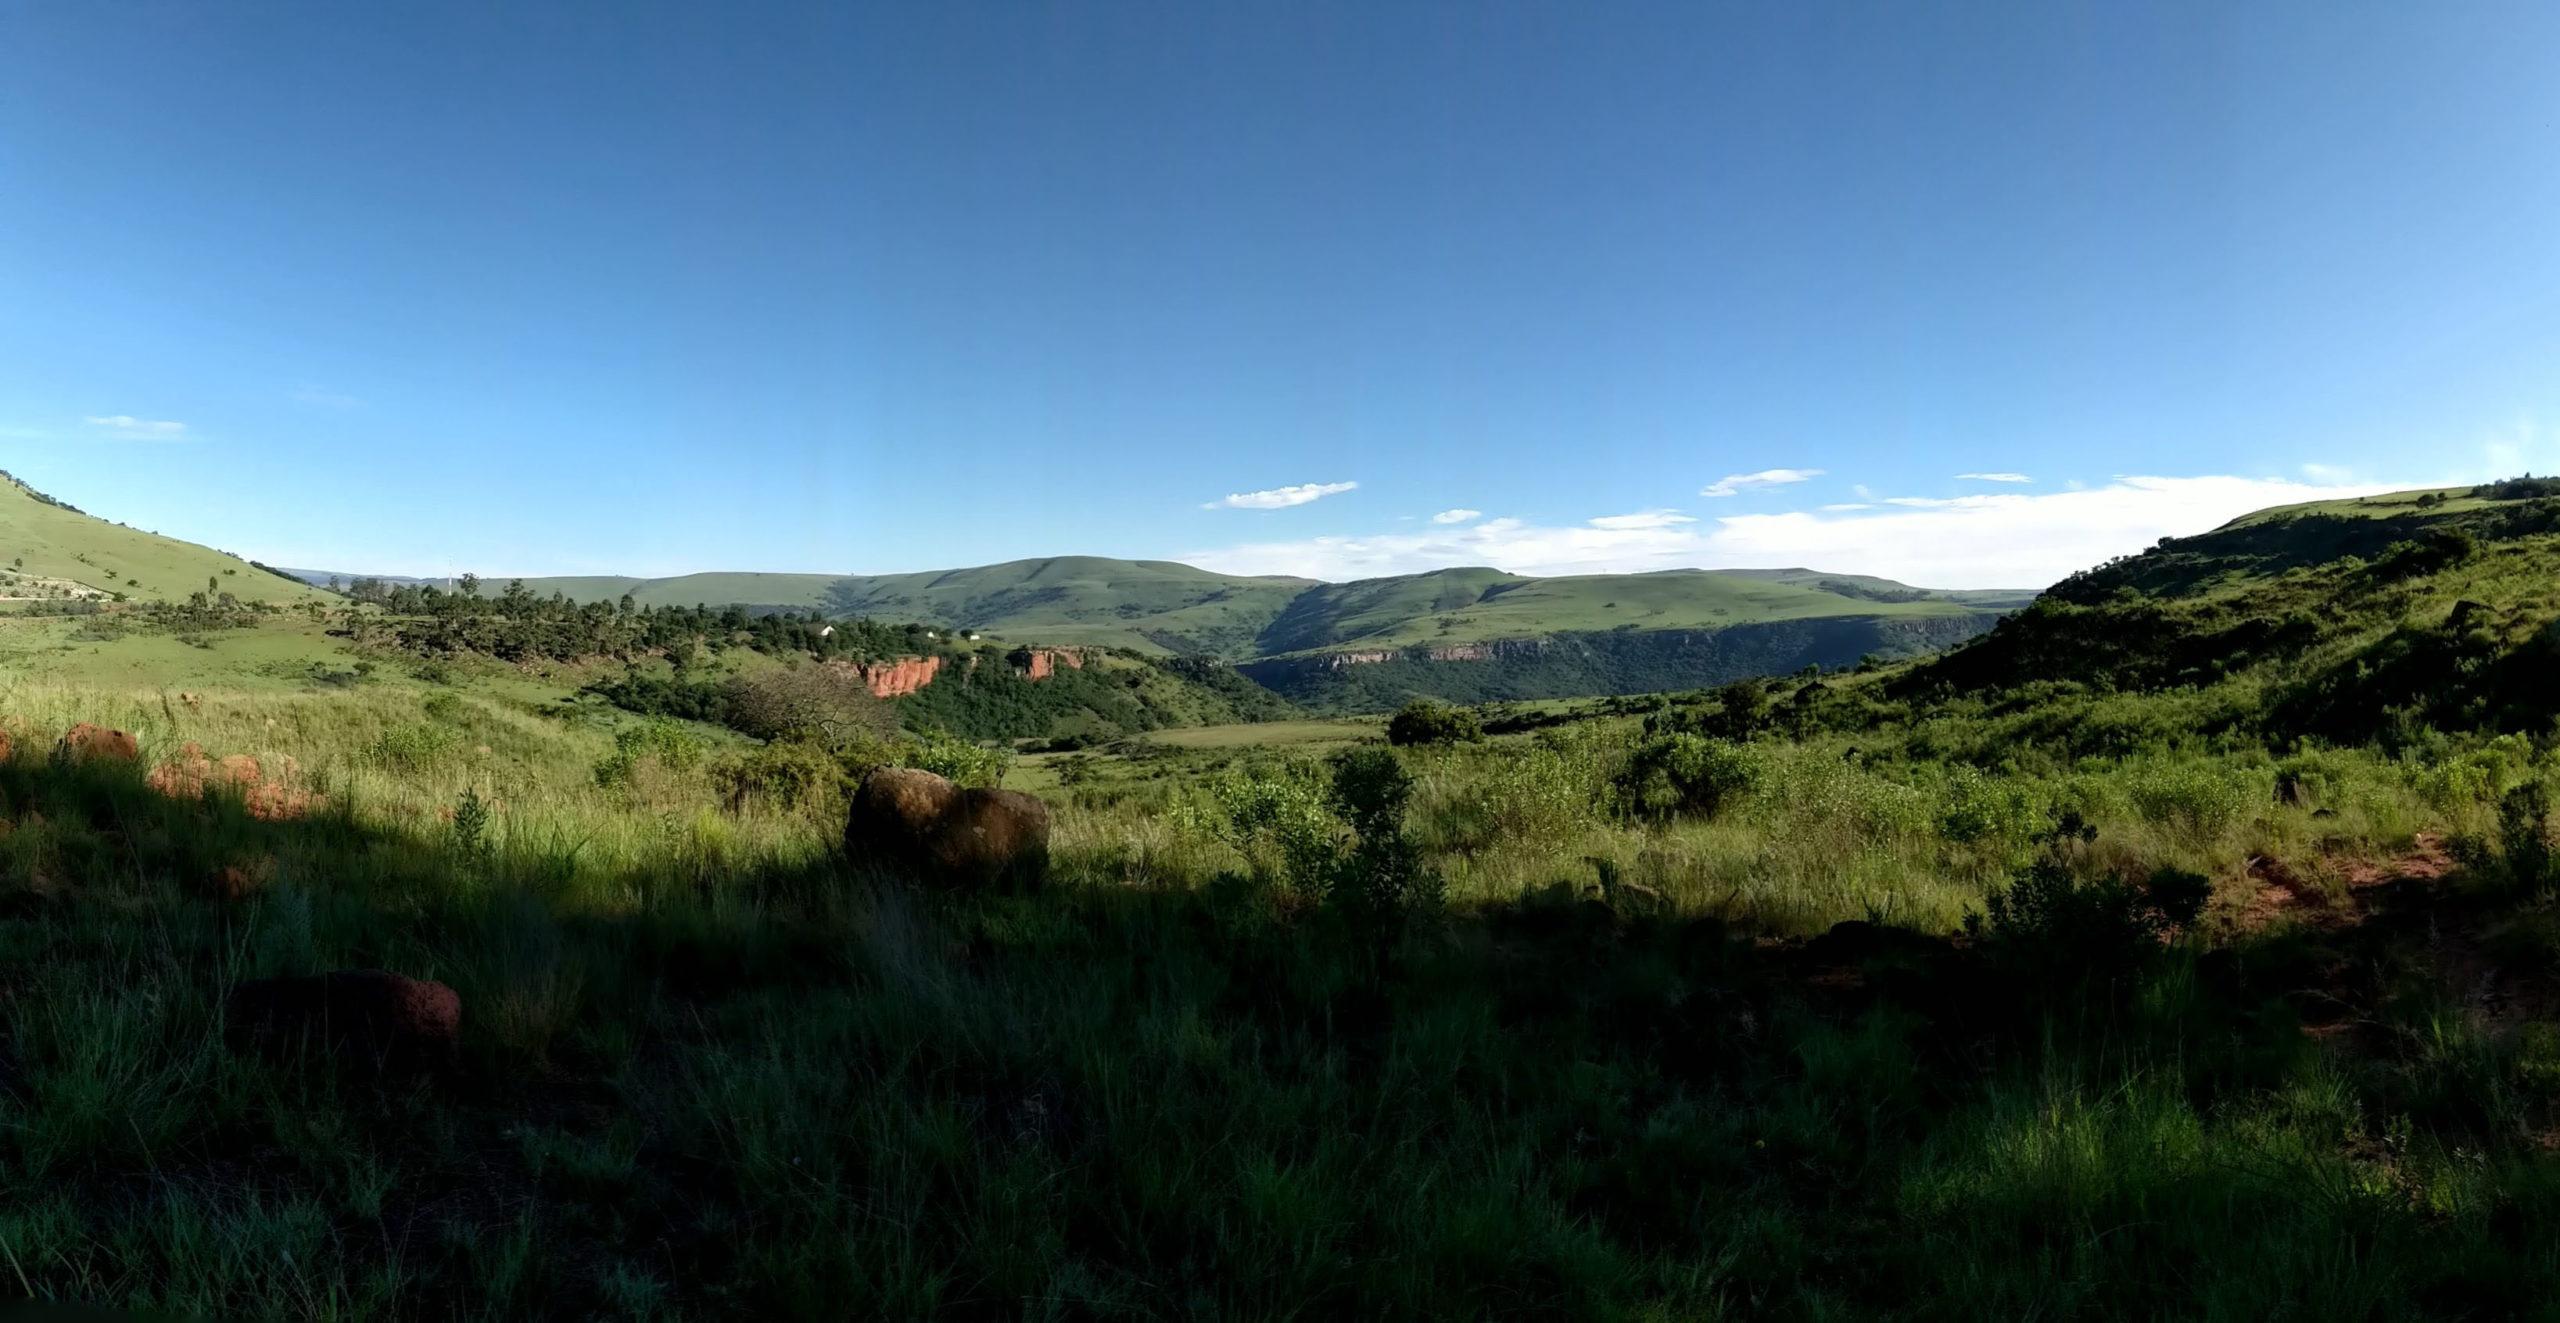 emgwenya landscape